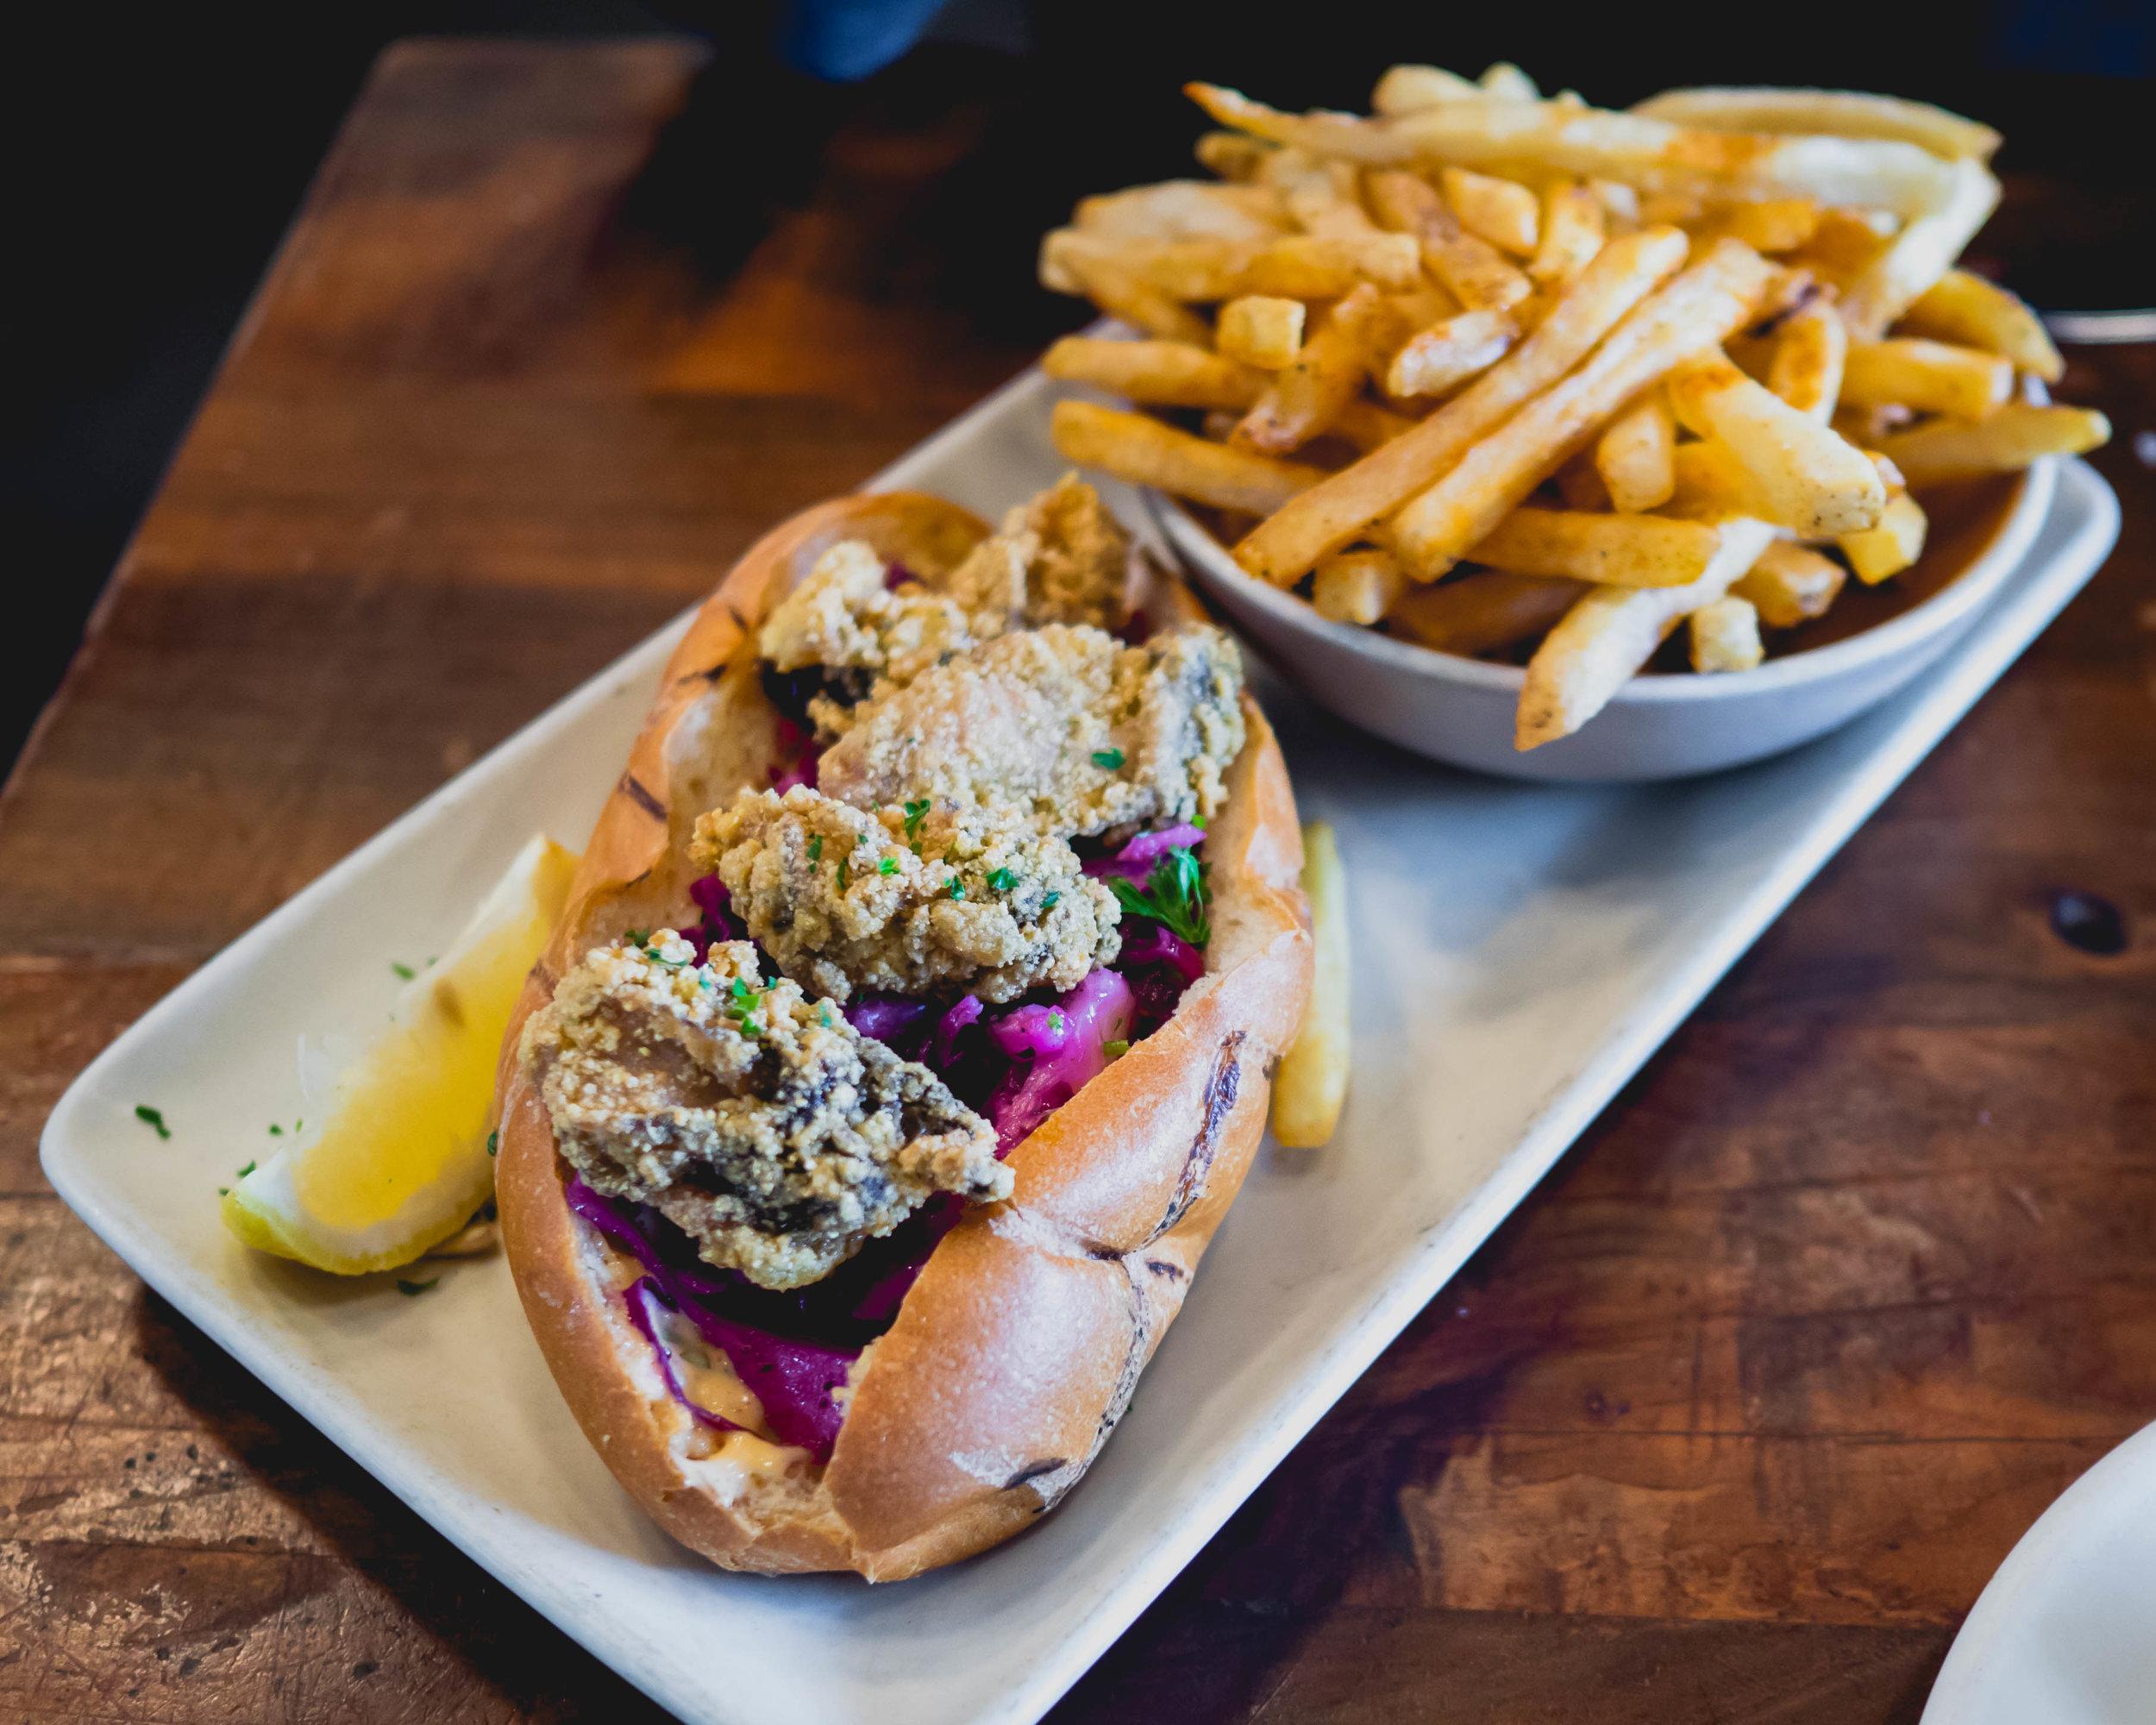 oyster po' boy sandwich : cornmeal fried oysters, hogwash slaw, remoulade, old bay fries.